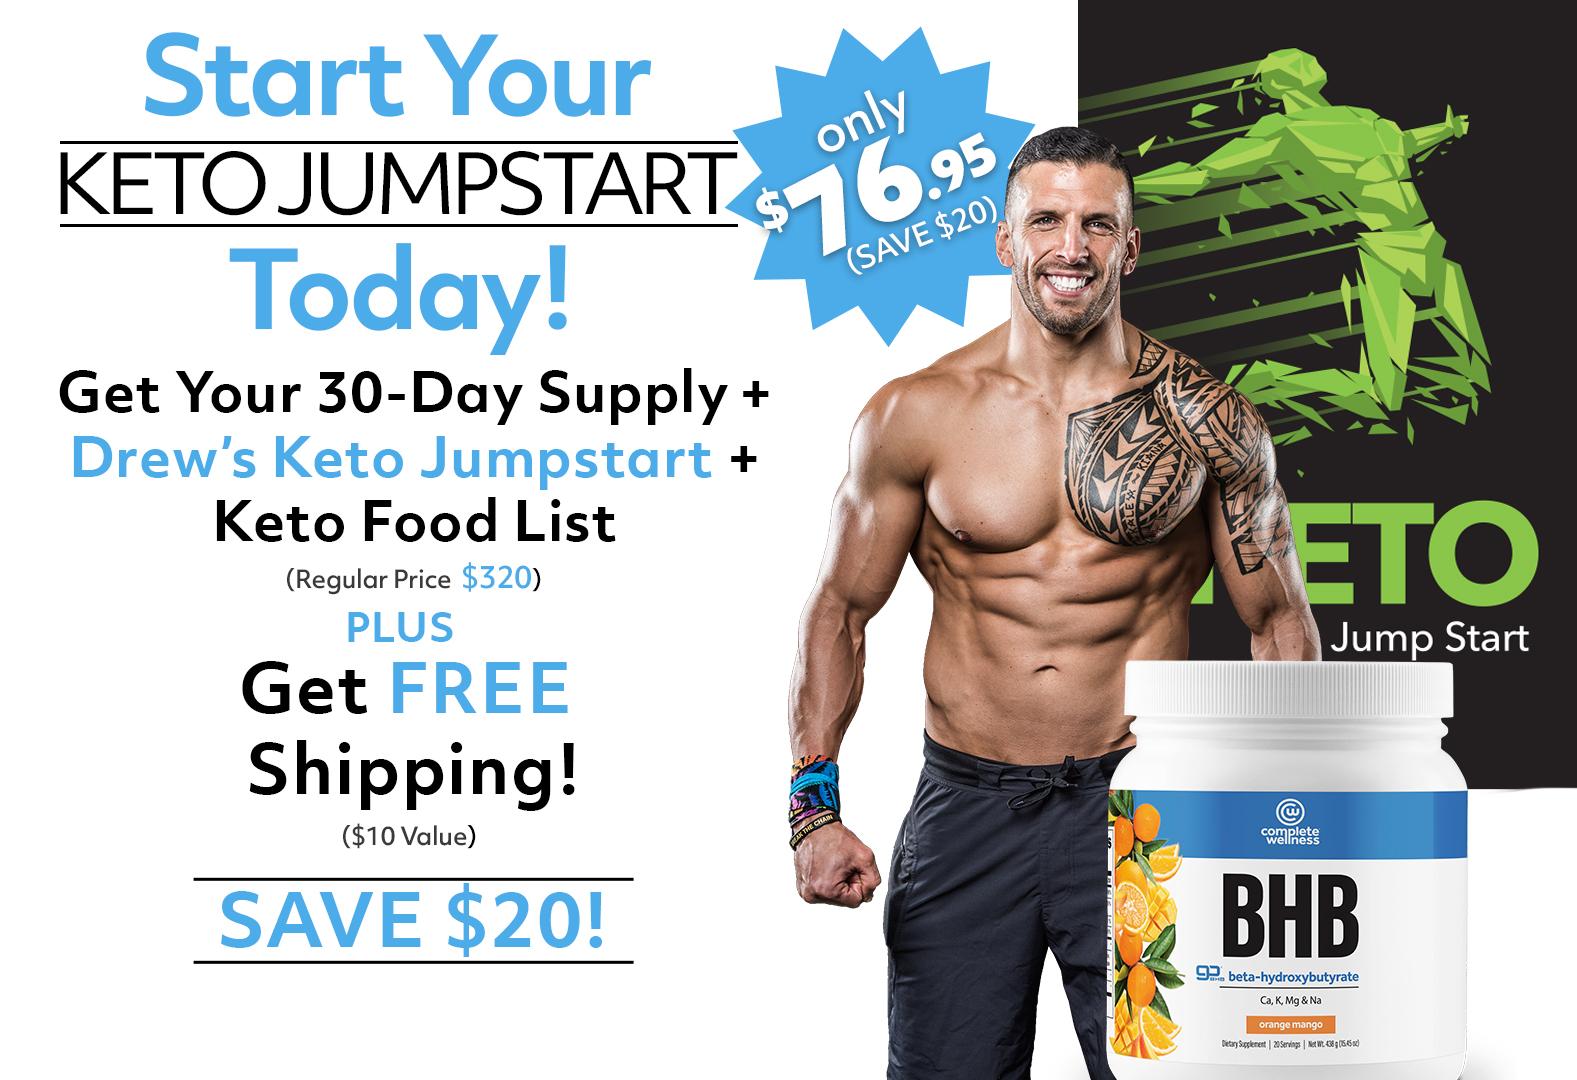 Complete BHB's + Drew Manning's 60 Day Keto Jumpstart